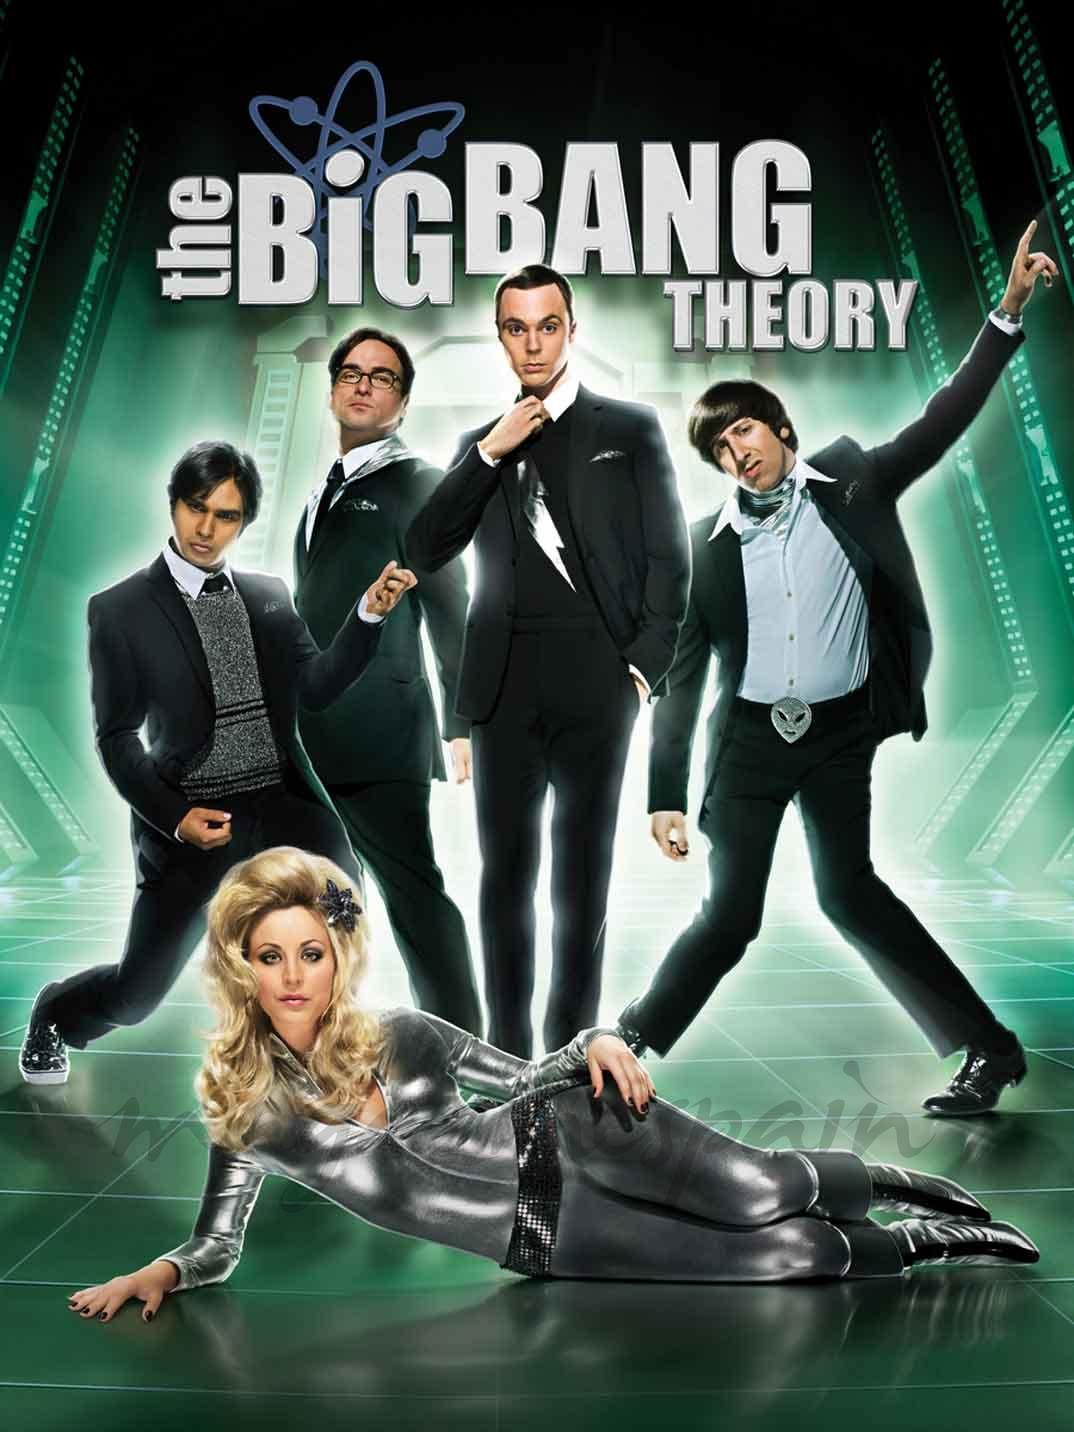 Jim Parsons, Johnny Galecki, Kaley Cuoco, Kunal Nayyar, Simon Helberg - The Big Bang Theory